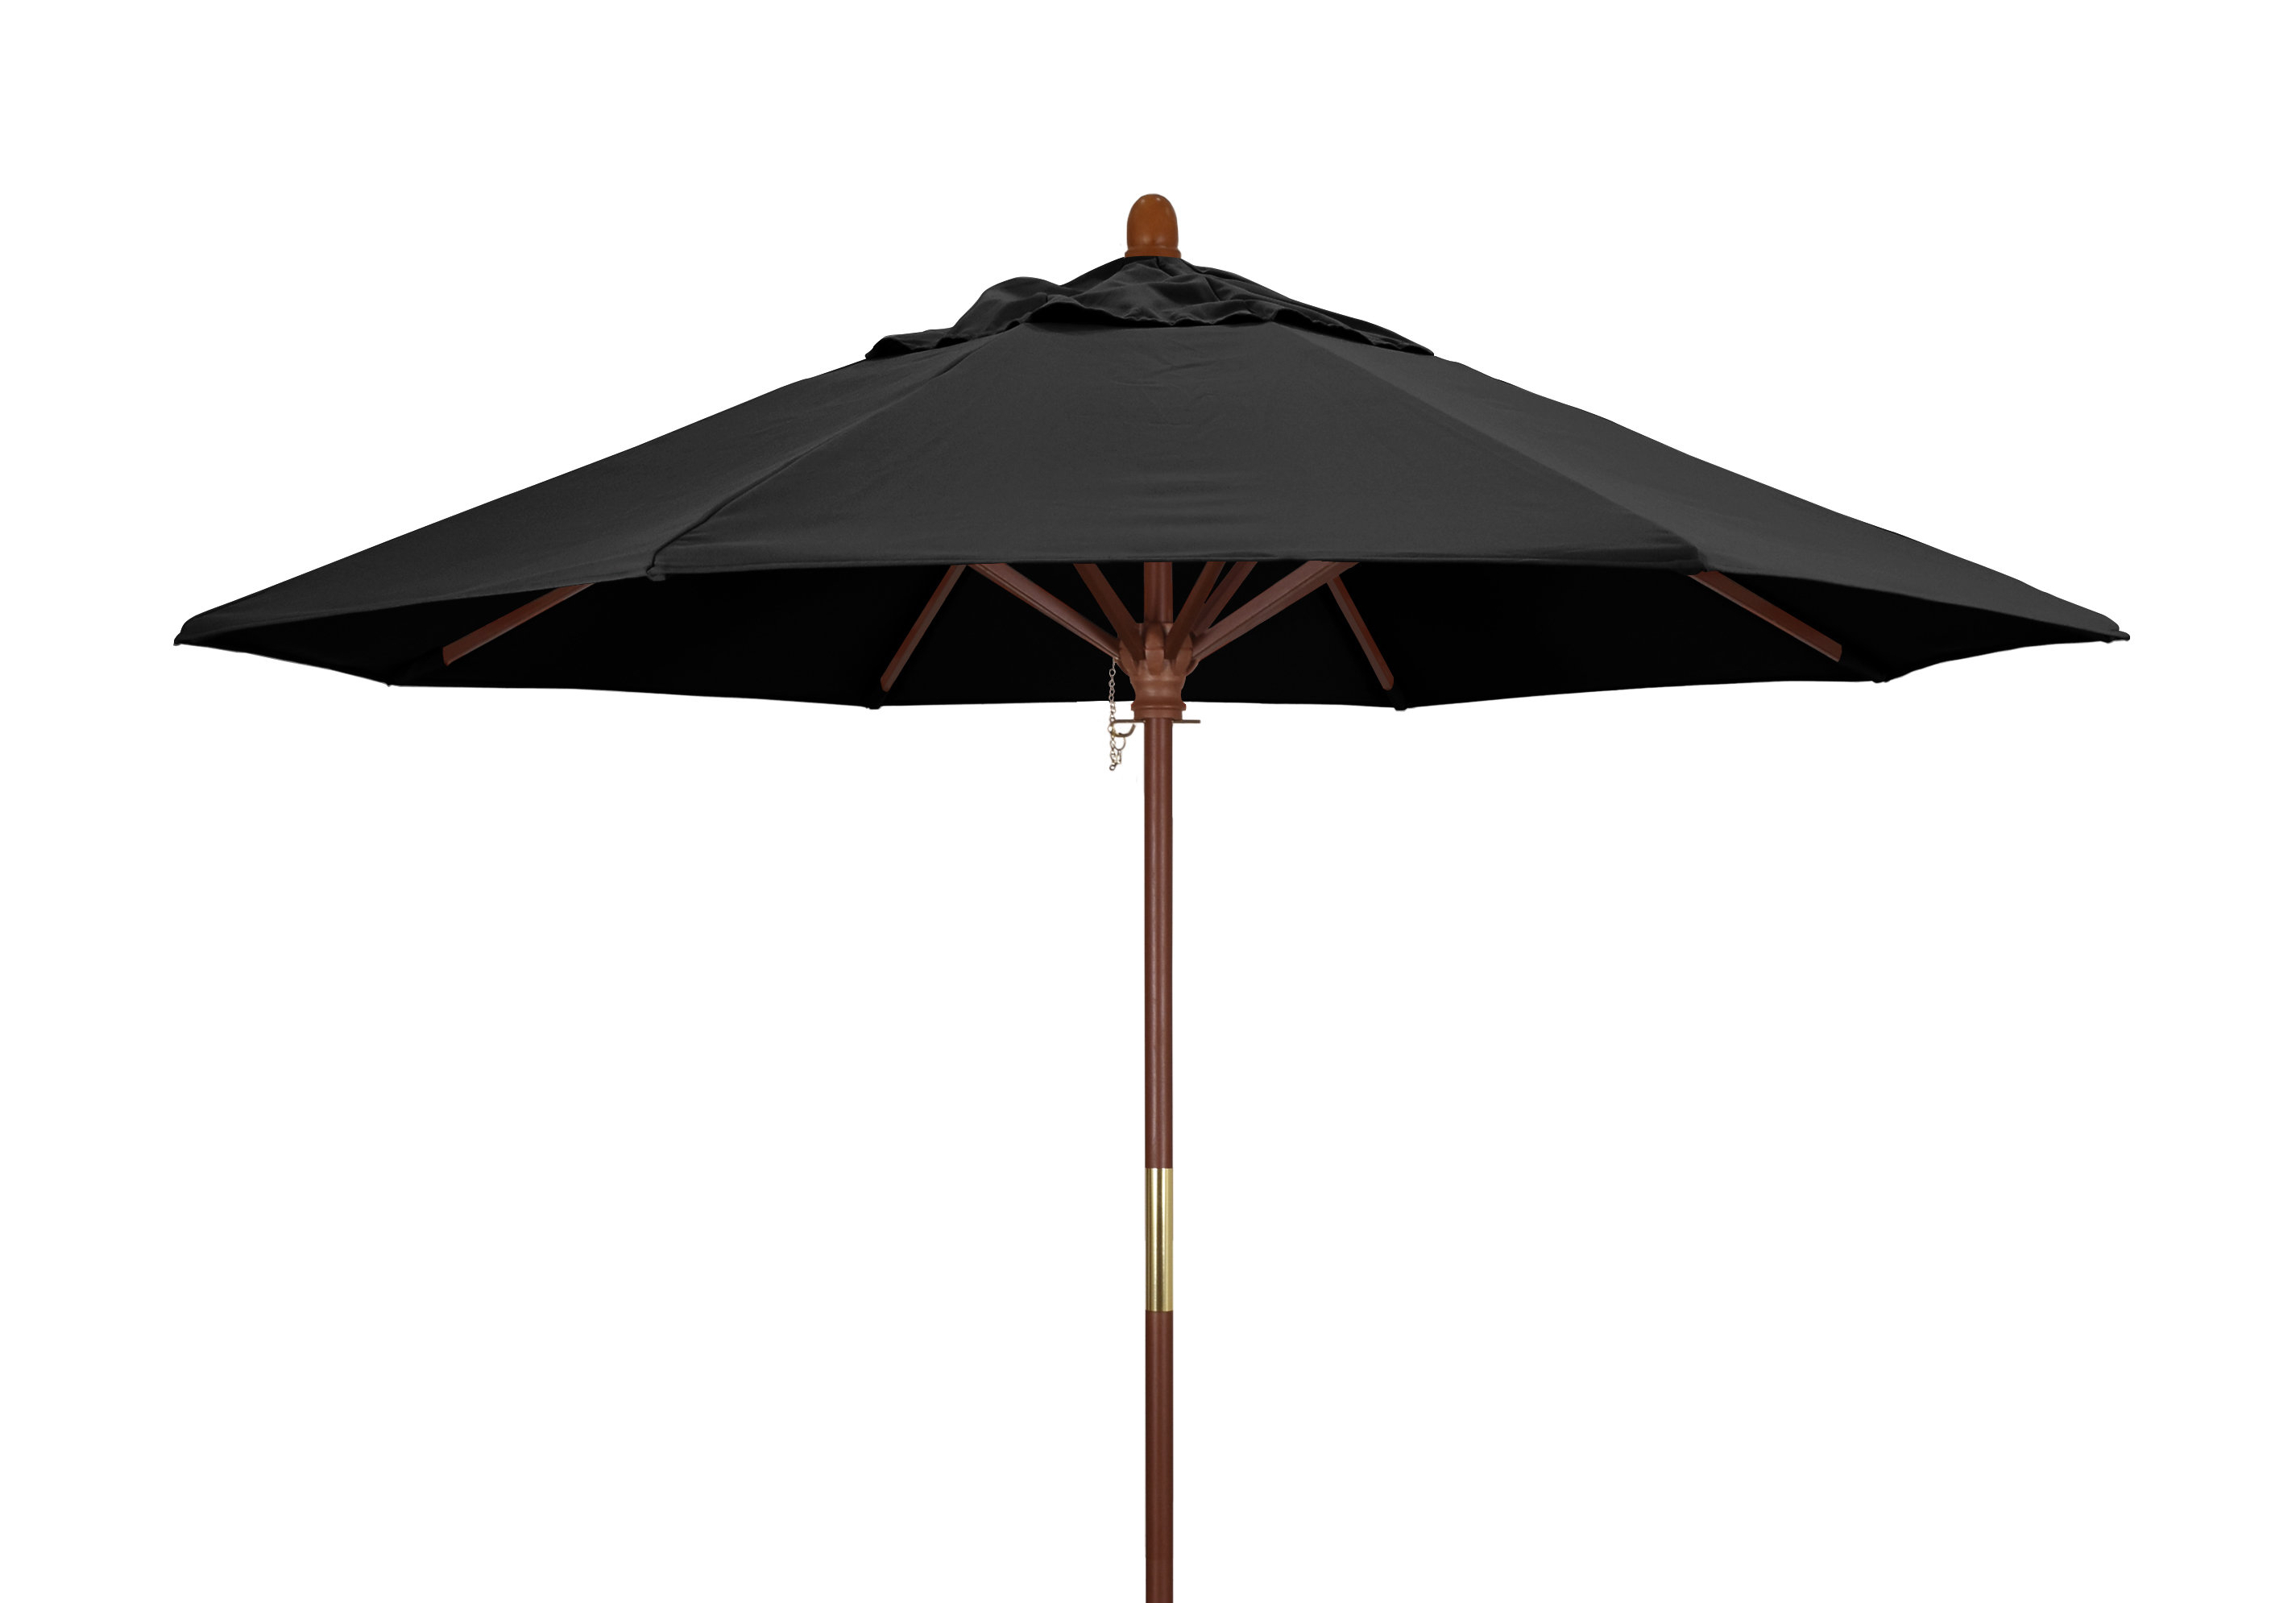 Mraz Market Umbrellas Pertaining To Popular Mraz 9' Market Umbrella (View 2 of 20)